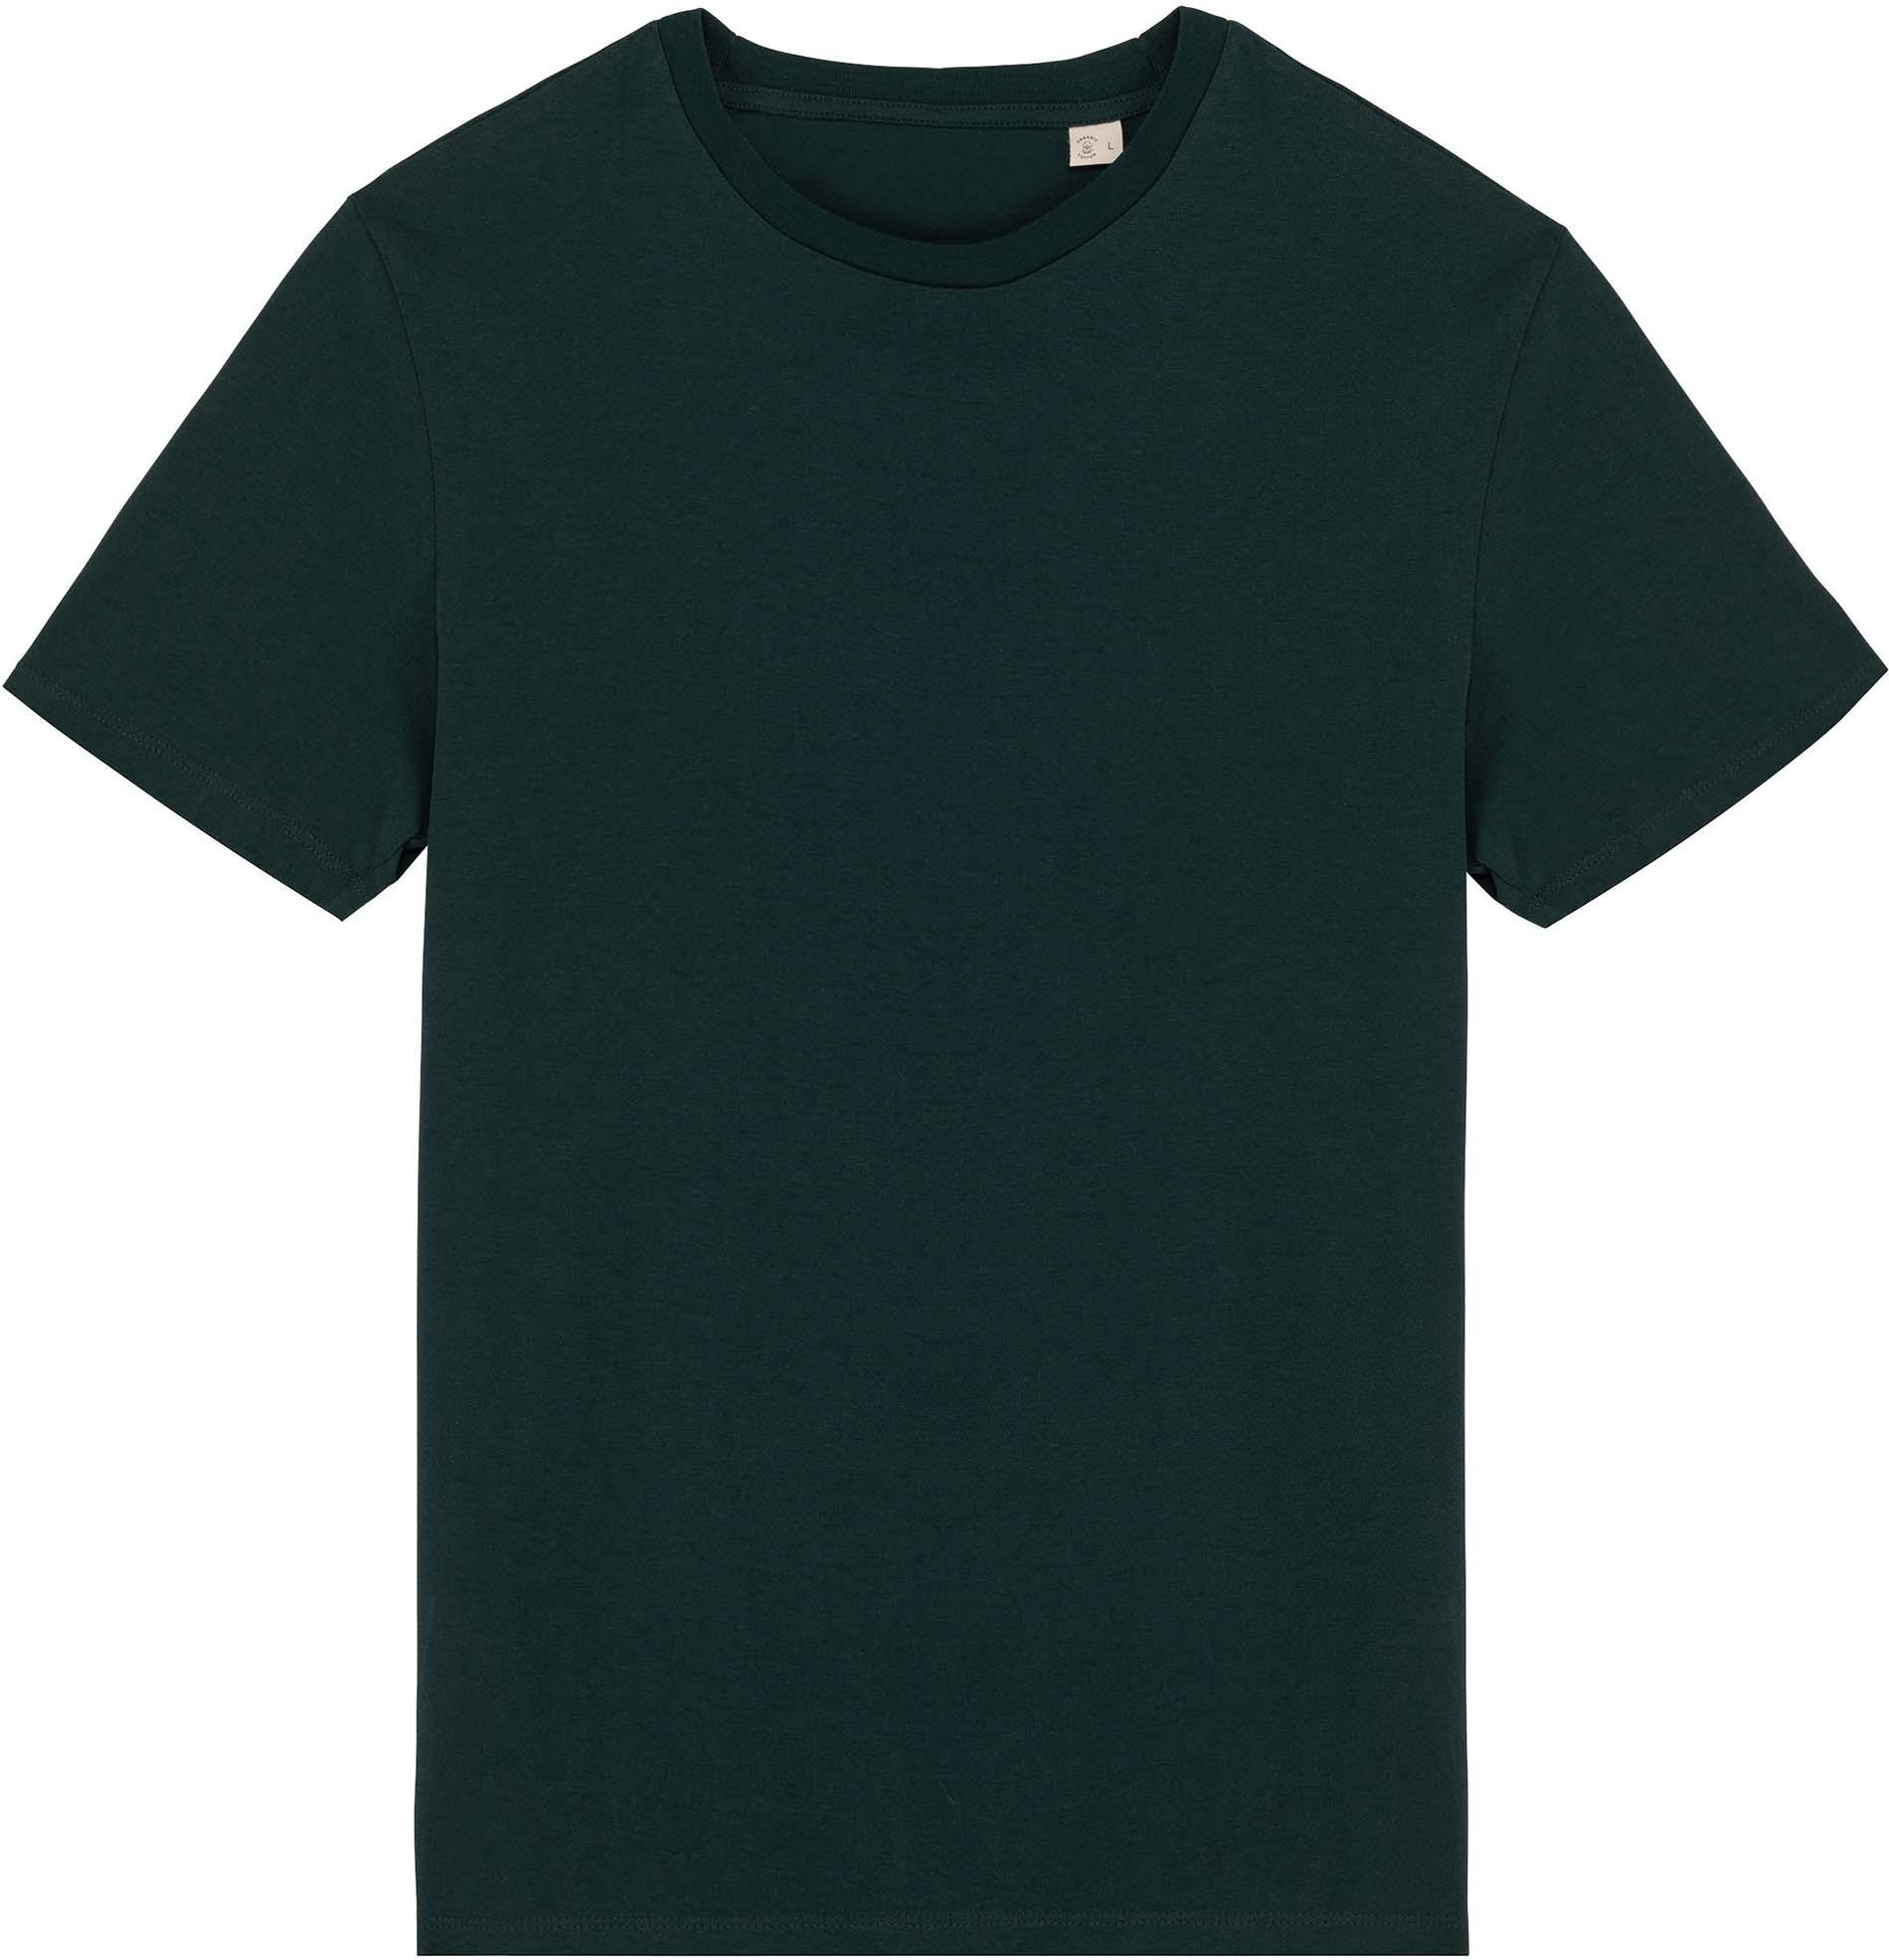 Tee-shirt manches courtes unisexe - 2-1843-4